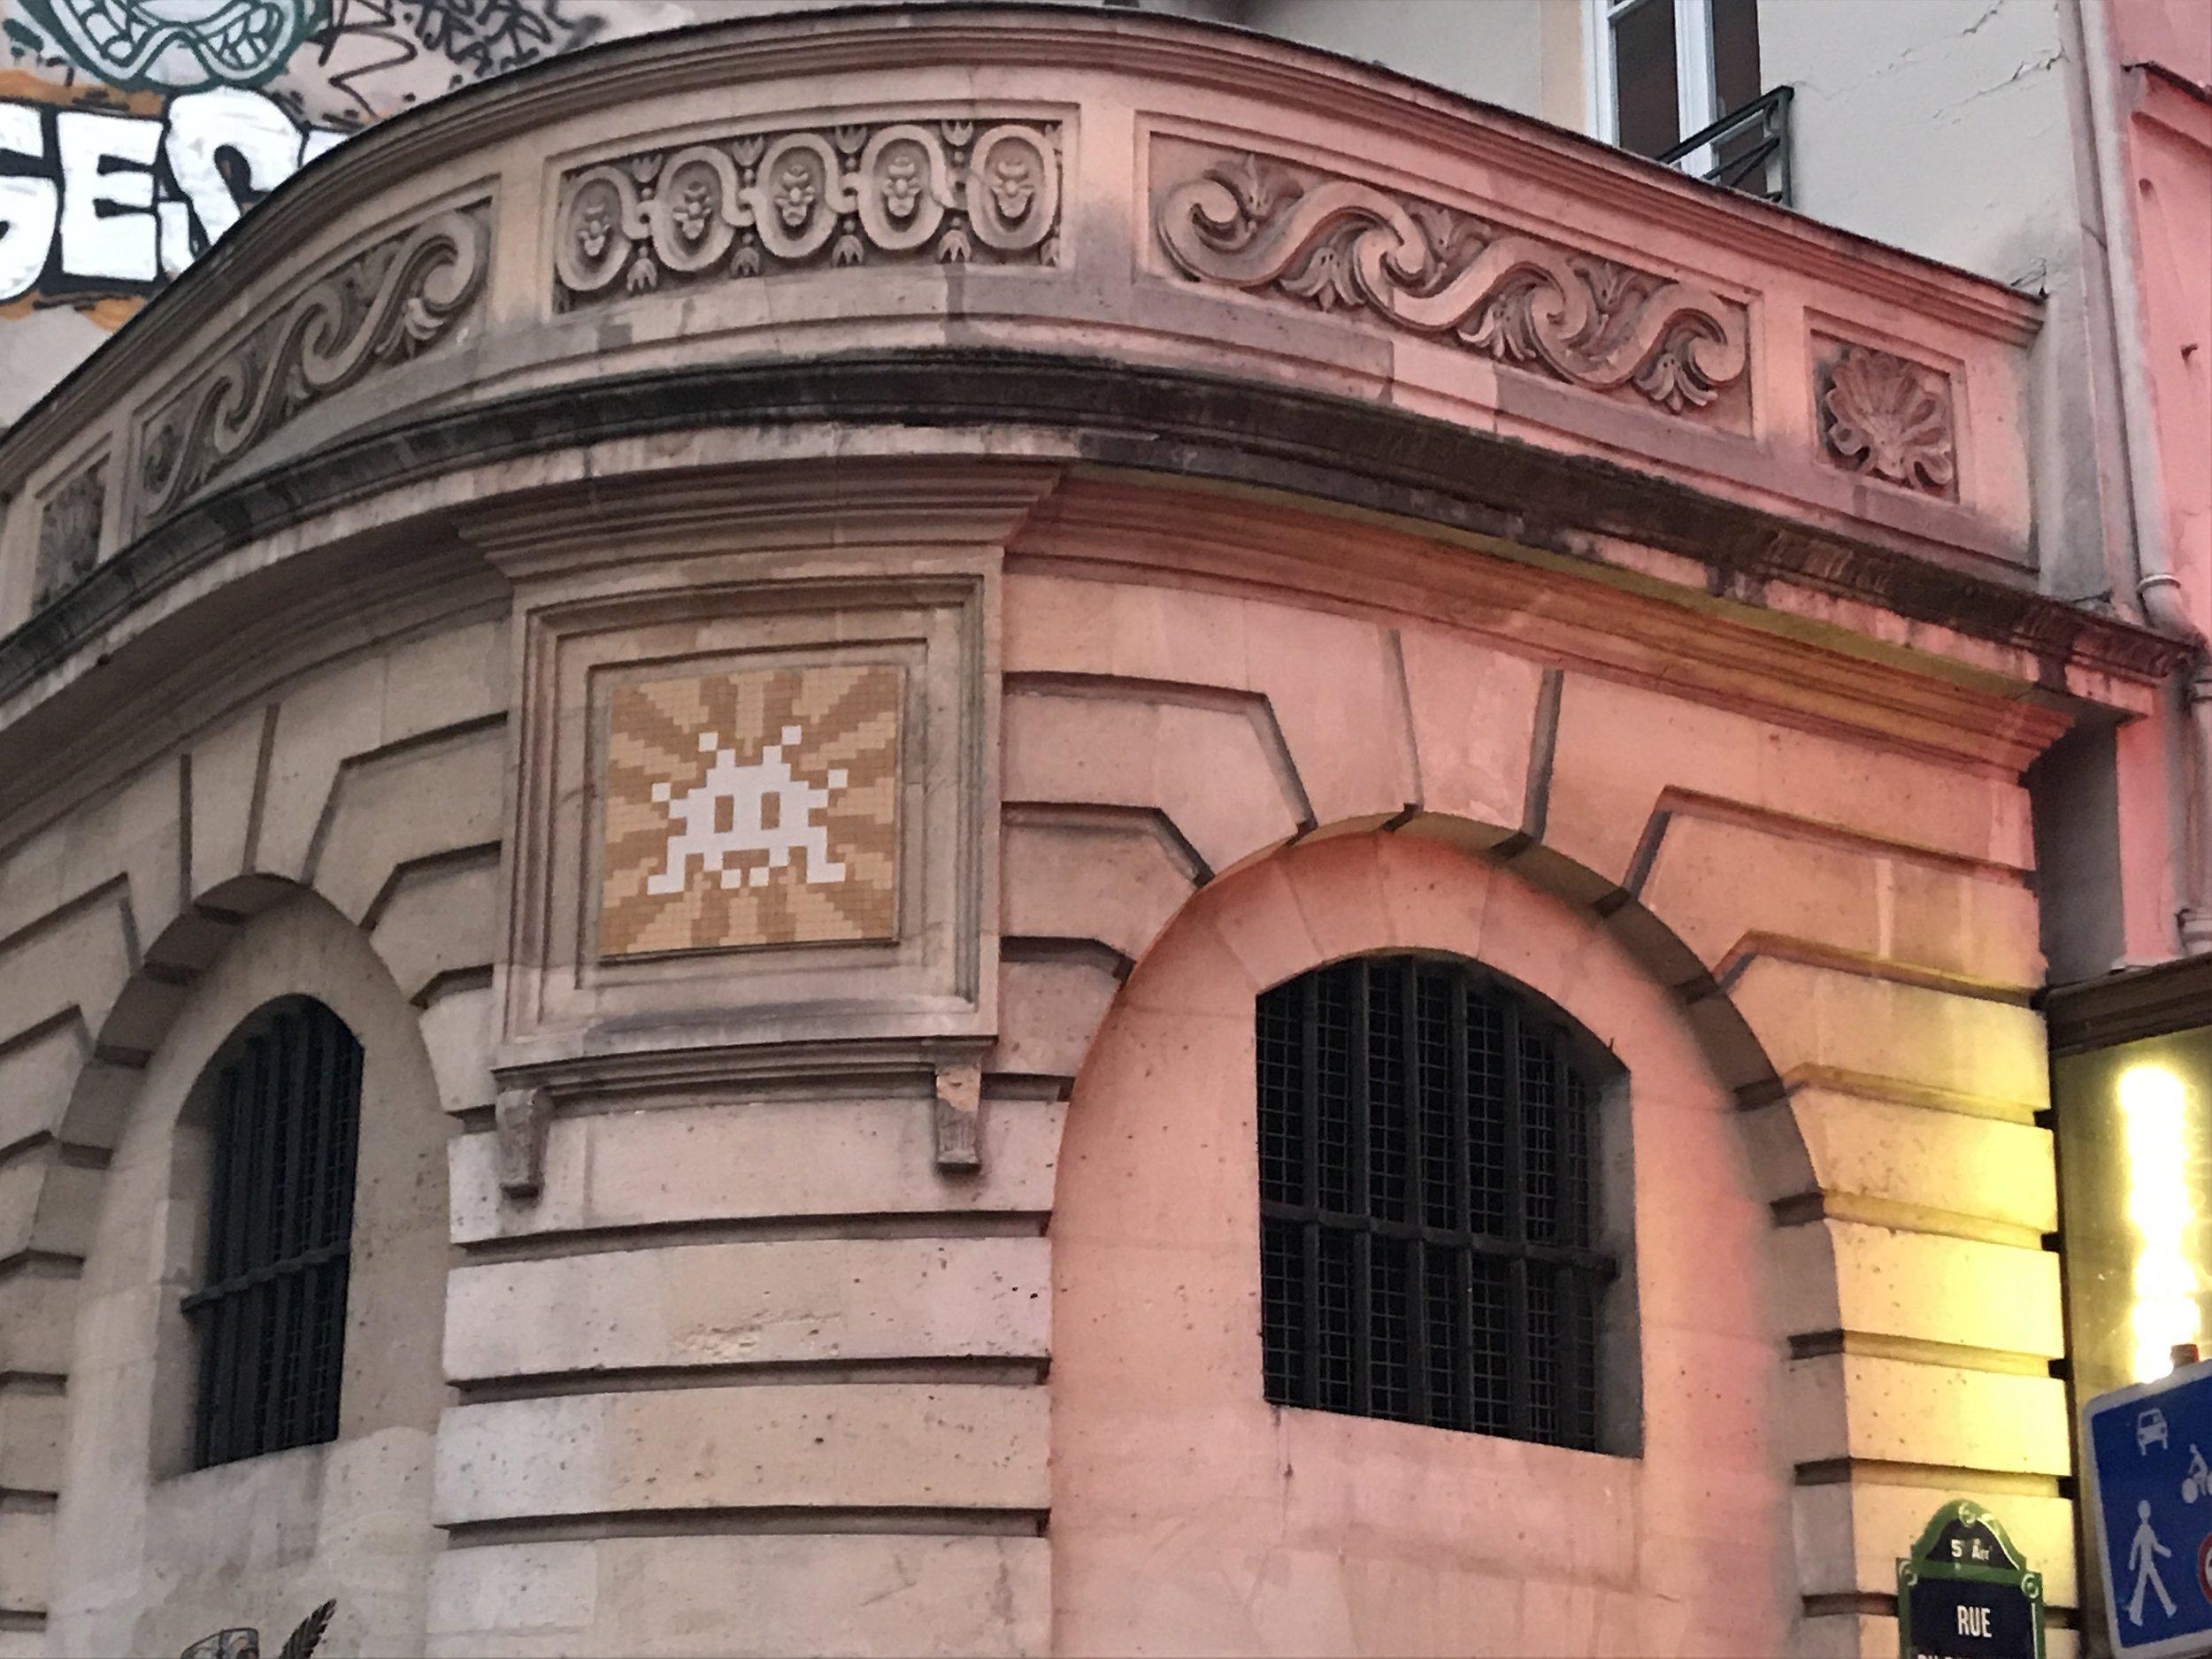 Dr Bookworm Space Invaders Mosaics Paris 3.JPG